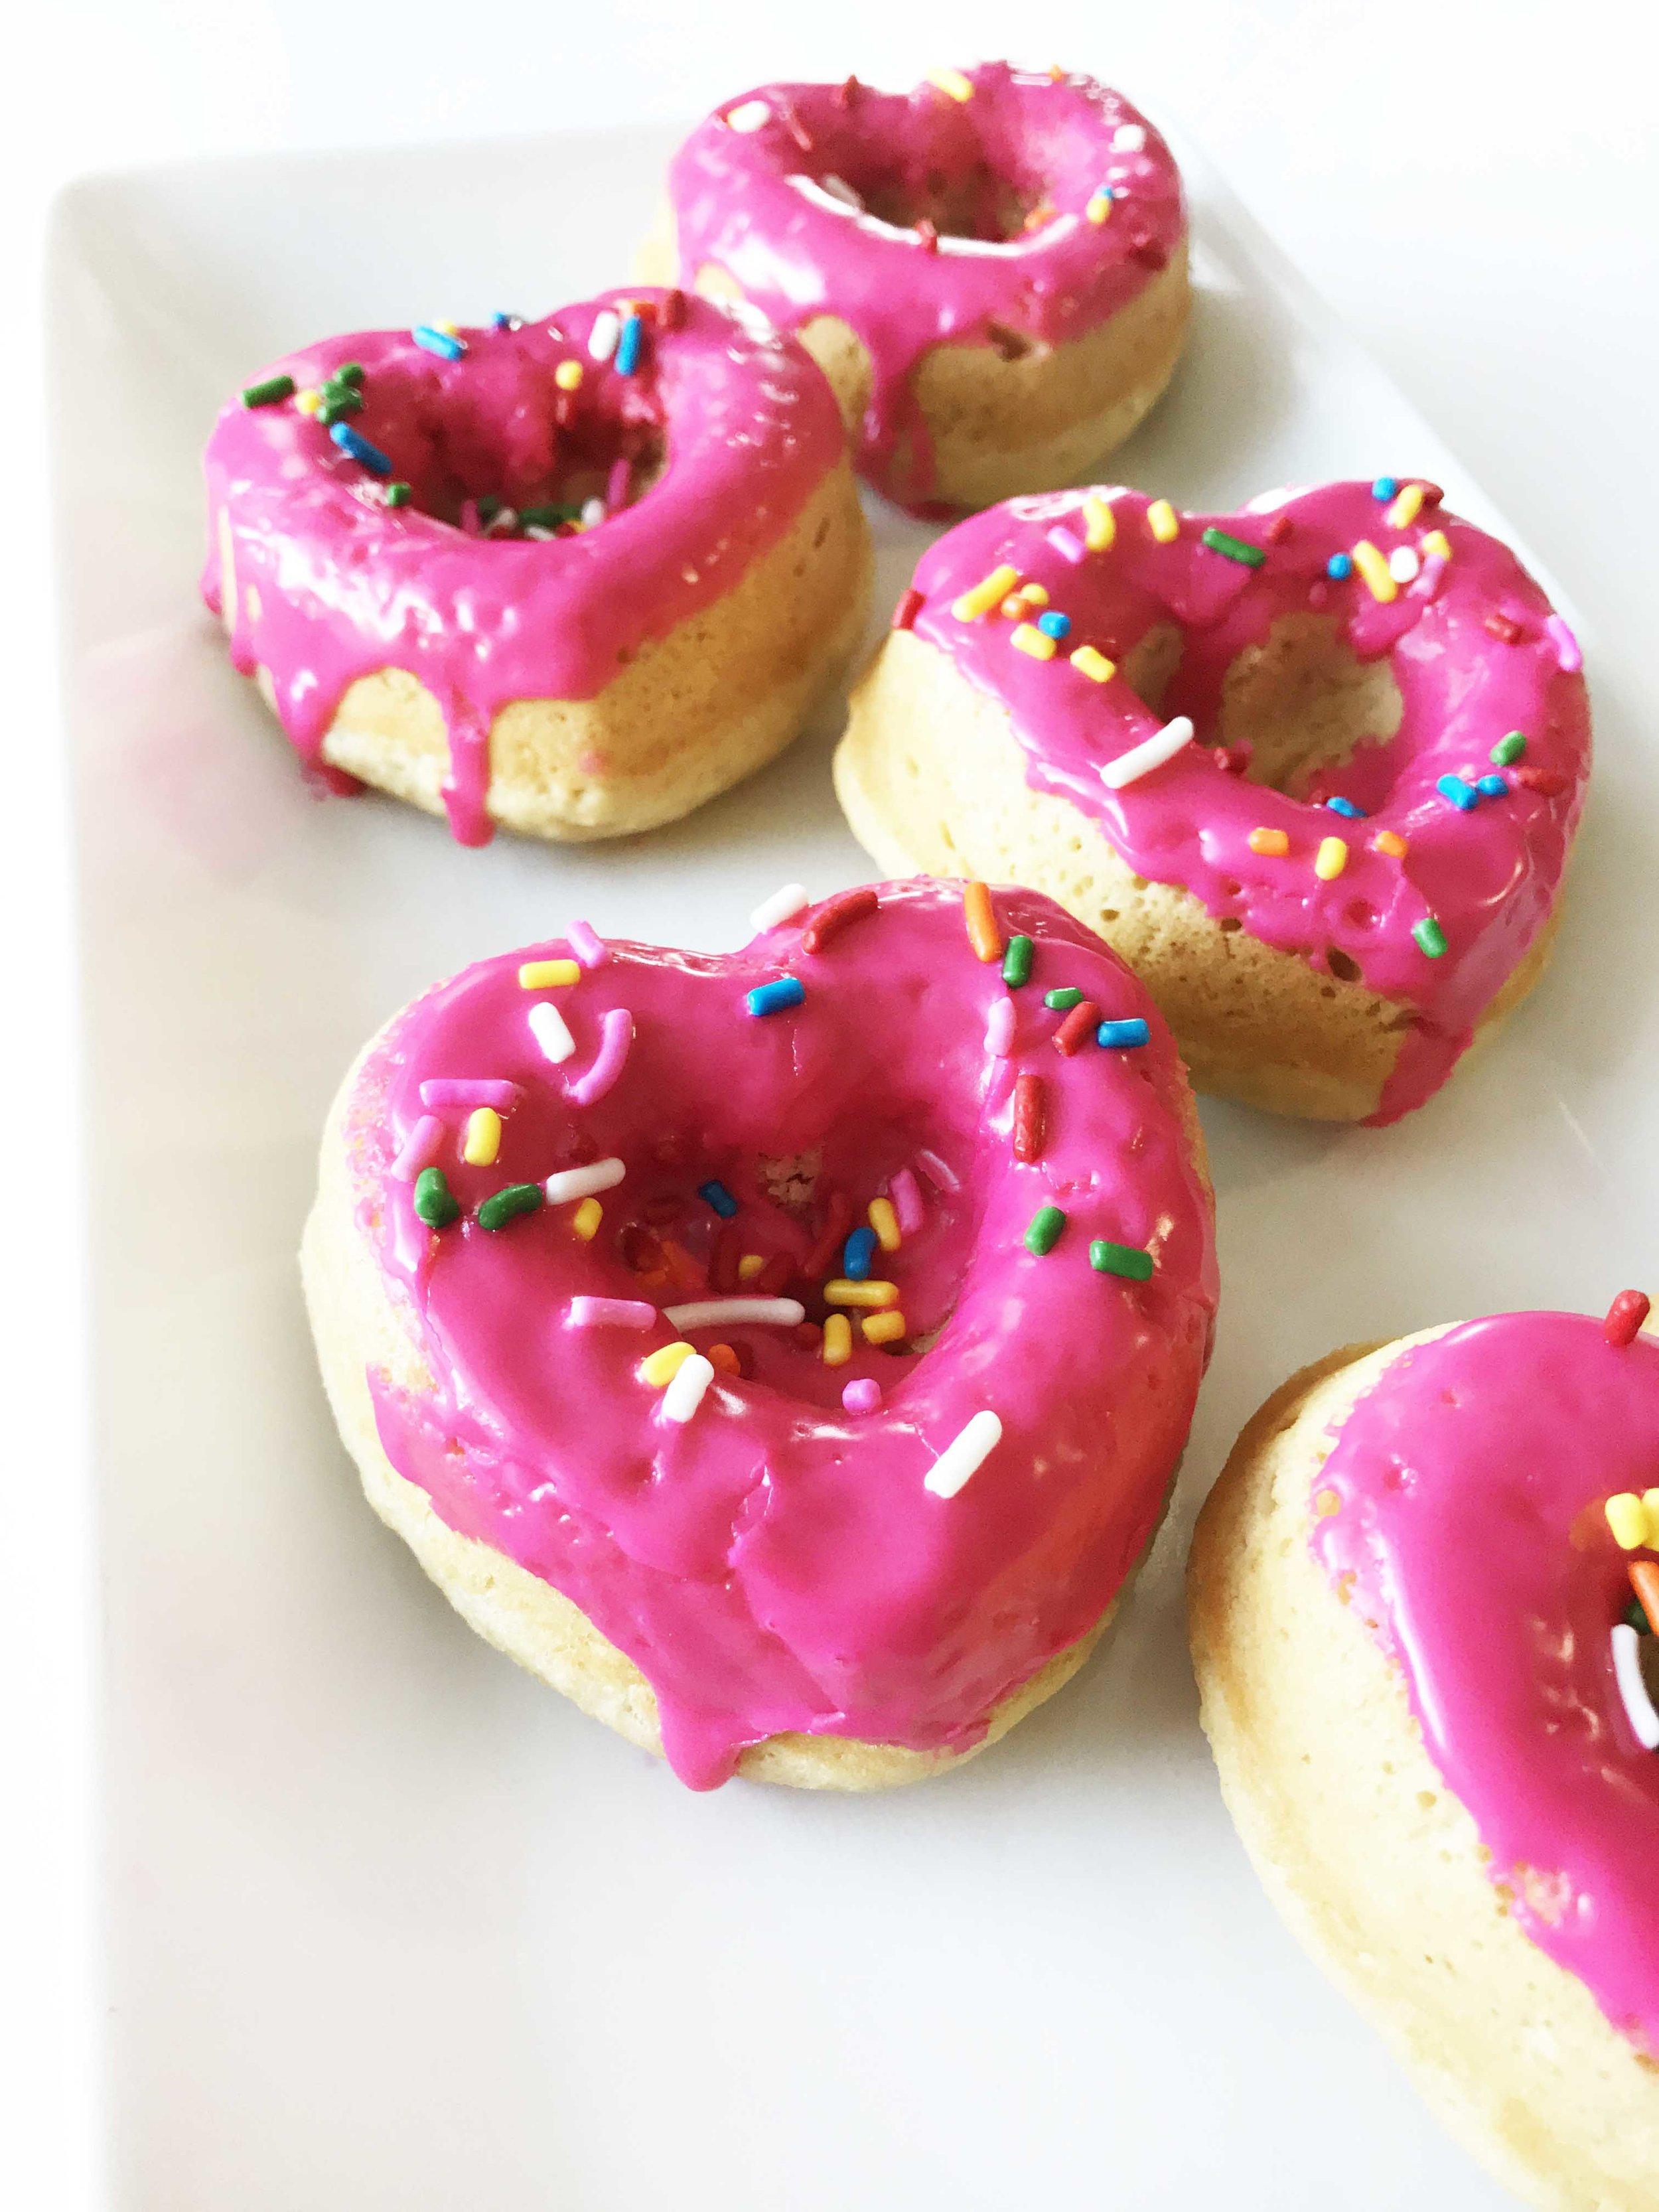 Graceful Skinny Donuts Skinny Fork Homer Simpson Donuts Image Homer Simpson Donuts Hell Gif nice food Homer Simpson Donuts